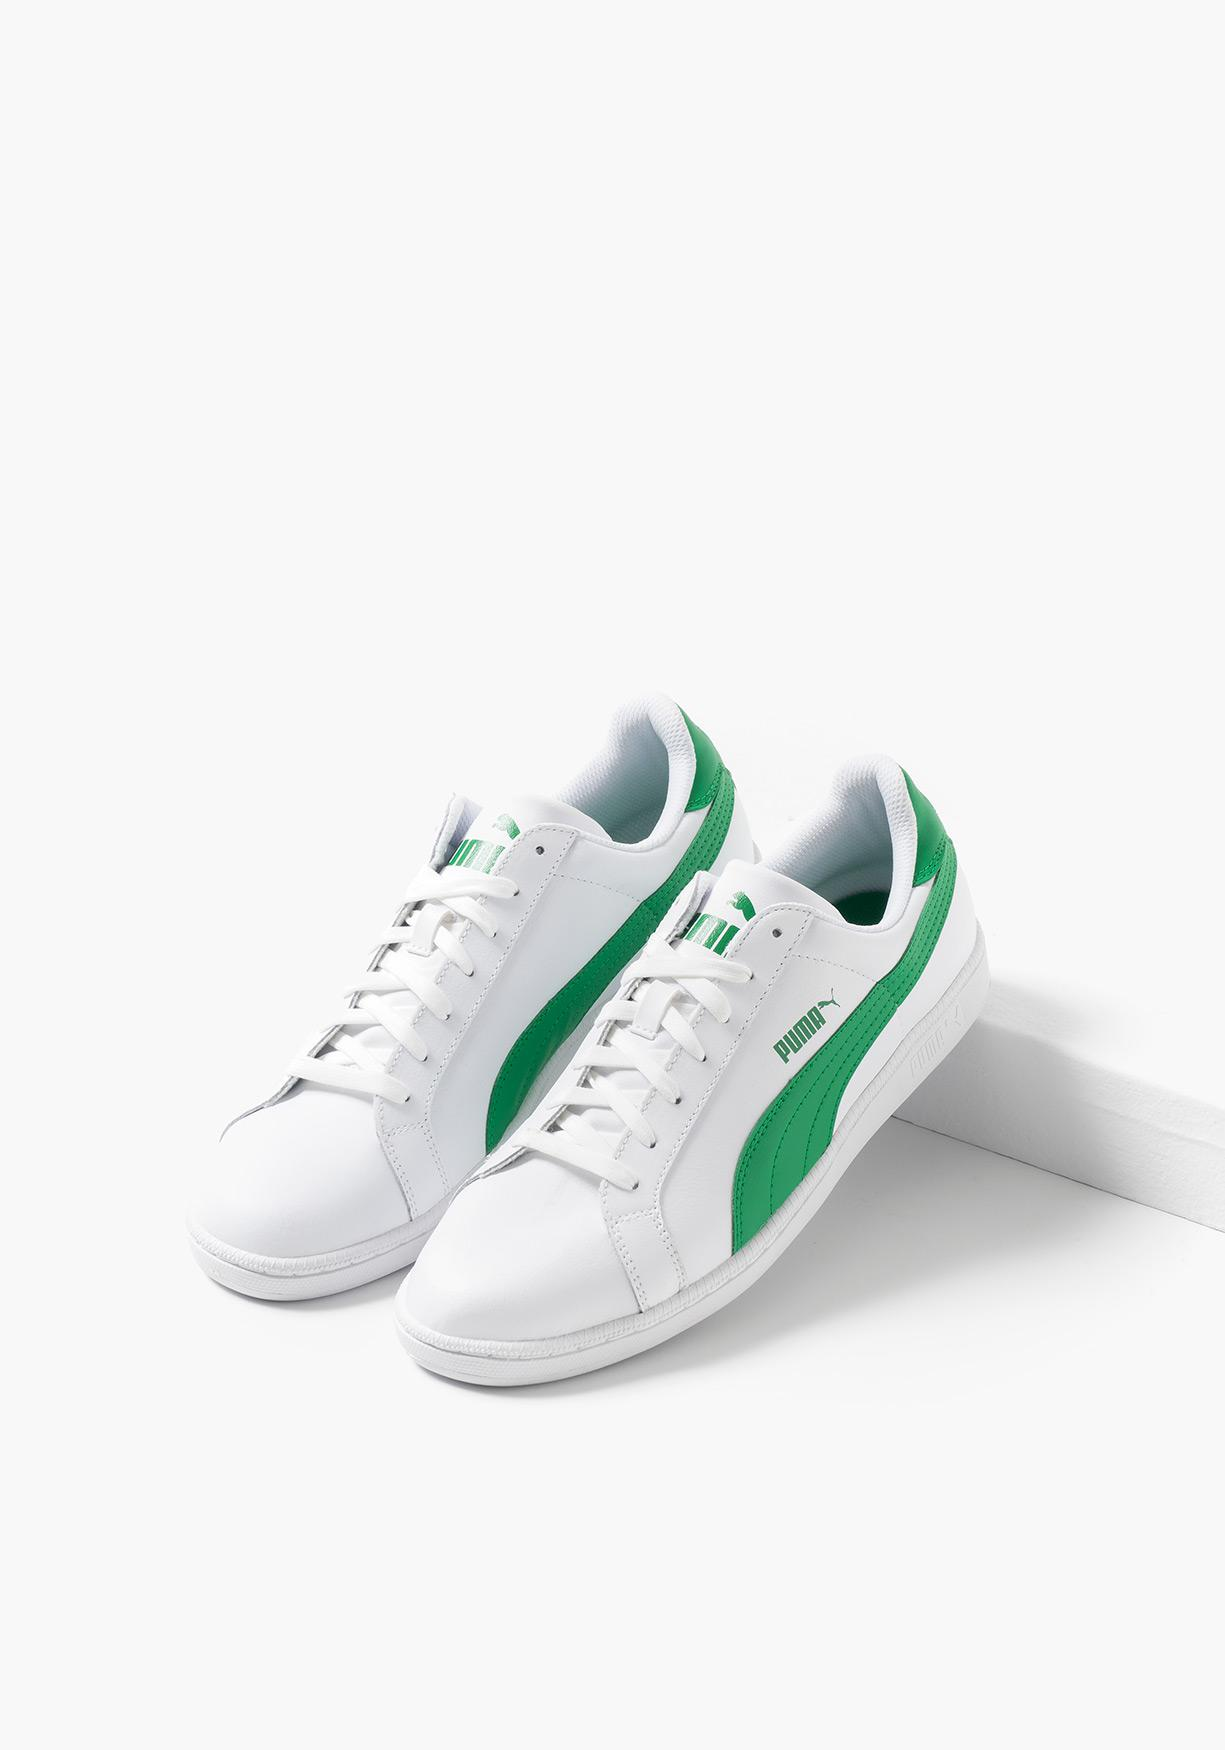 4b10a5f69 Comprar Zapatillas de deporte Smash de PUMA. ¡Aprovéchate de ...